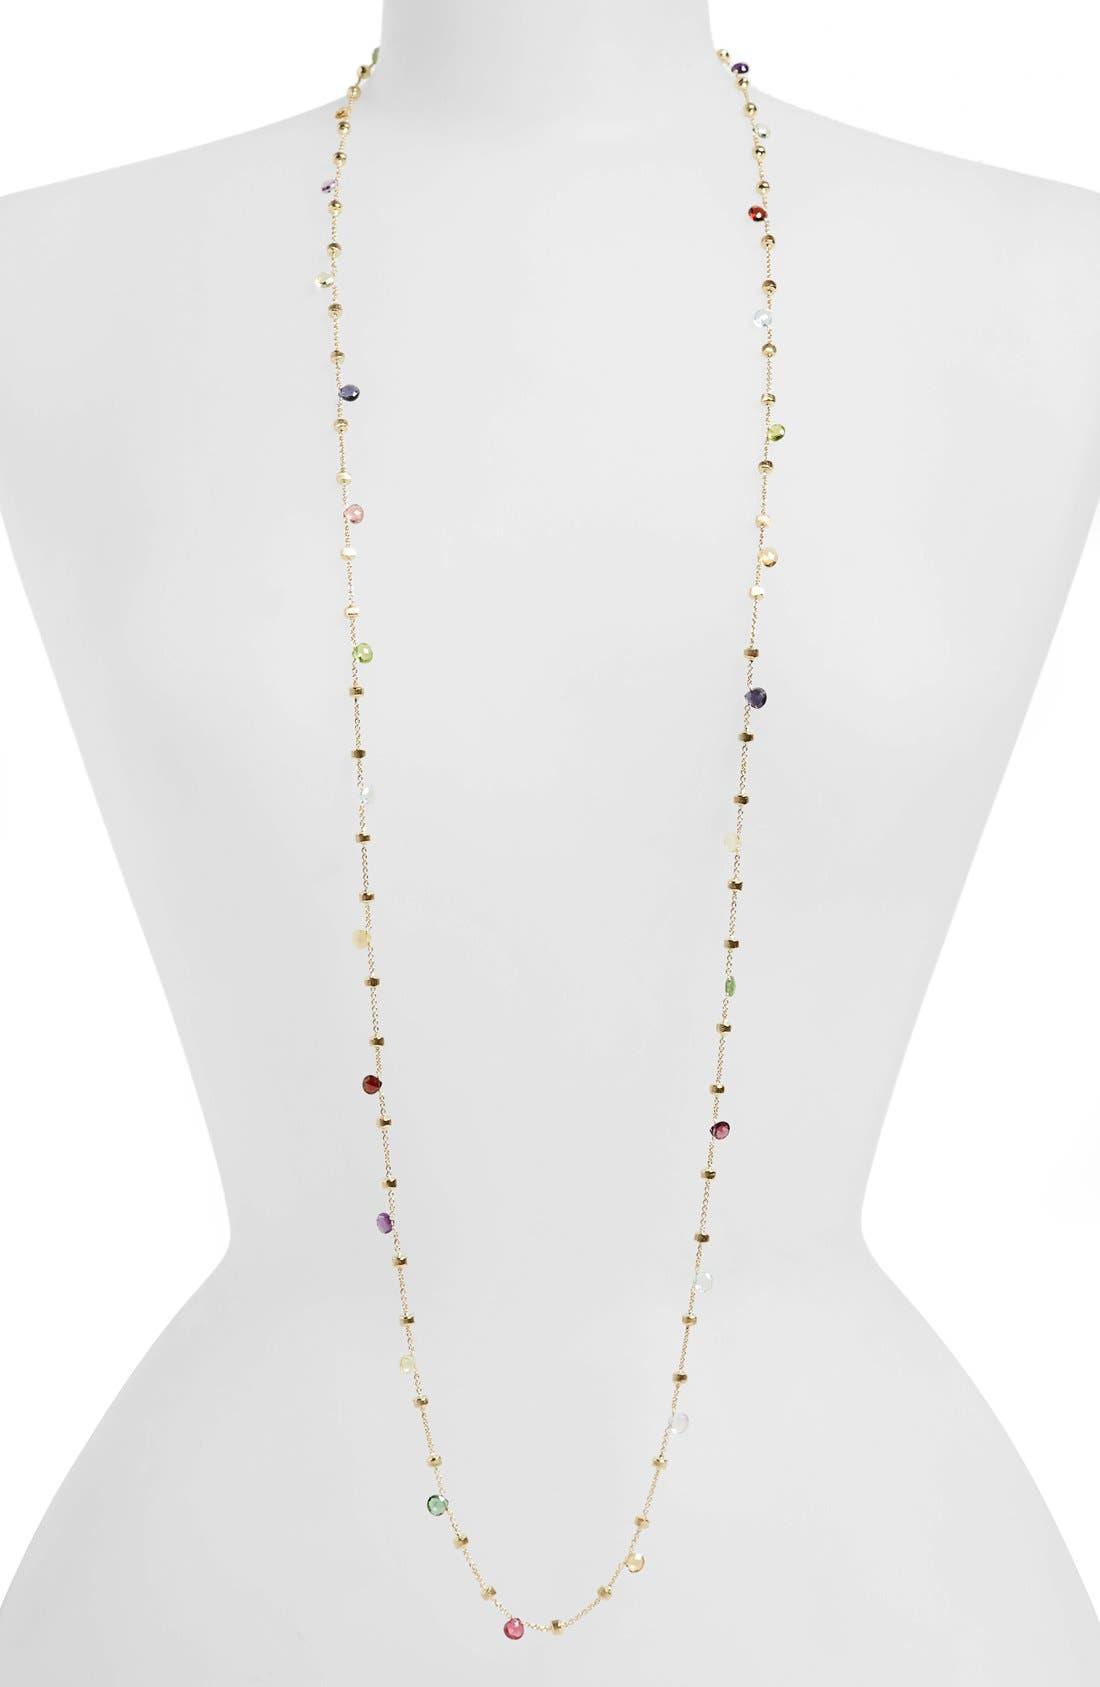 Main Image - Marco Bicego 'Paradise' Semiprecious Stone Long Necklace